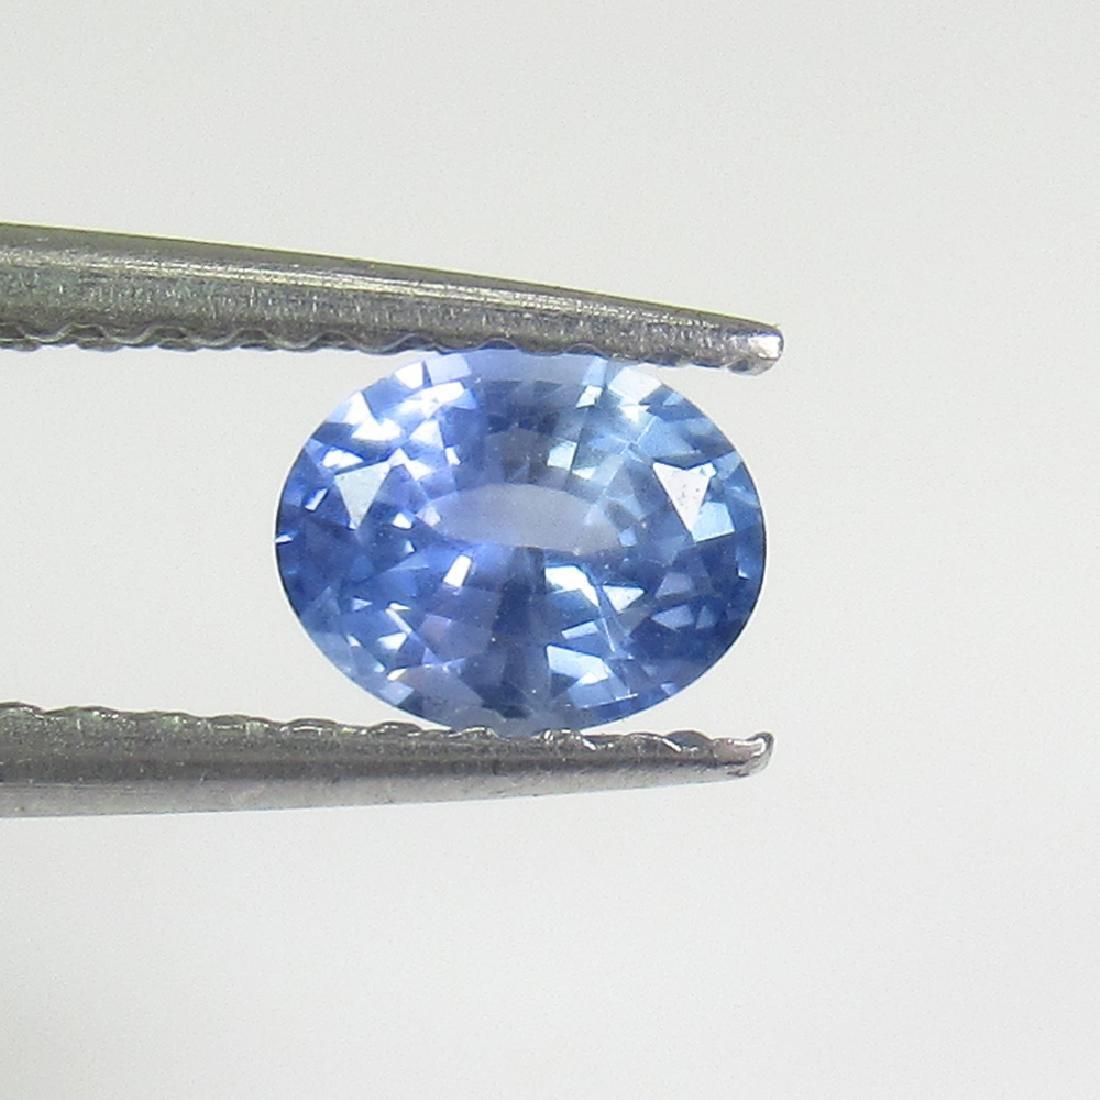 0.44 Ctw Natural Ceylon Blue Sapphire 5X4 mm Oval Cut